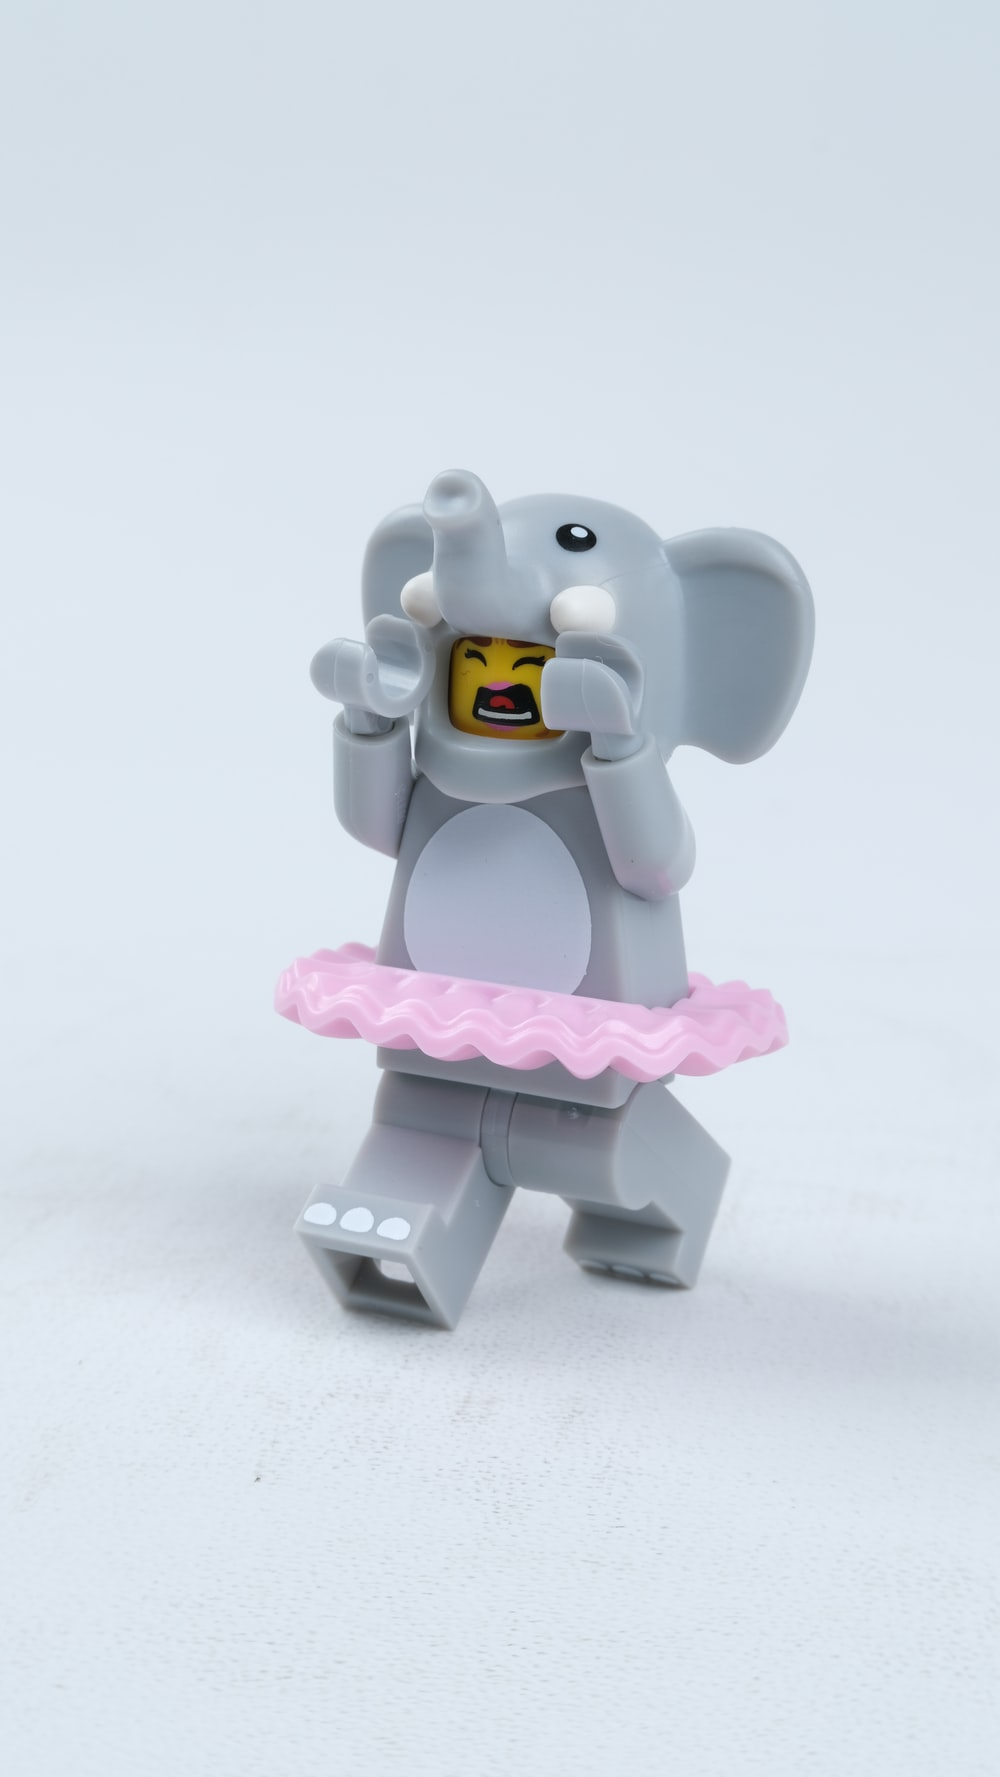 purple elephant figurine on white surface